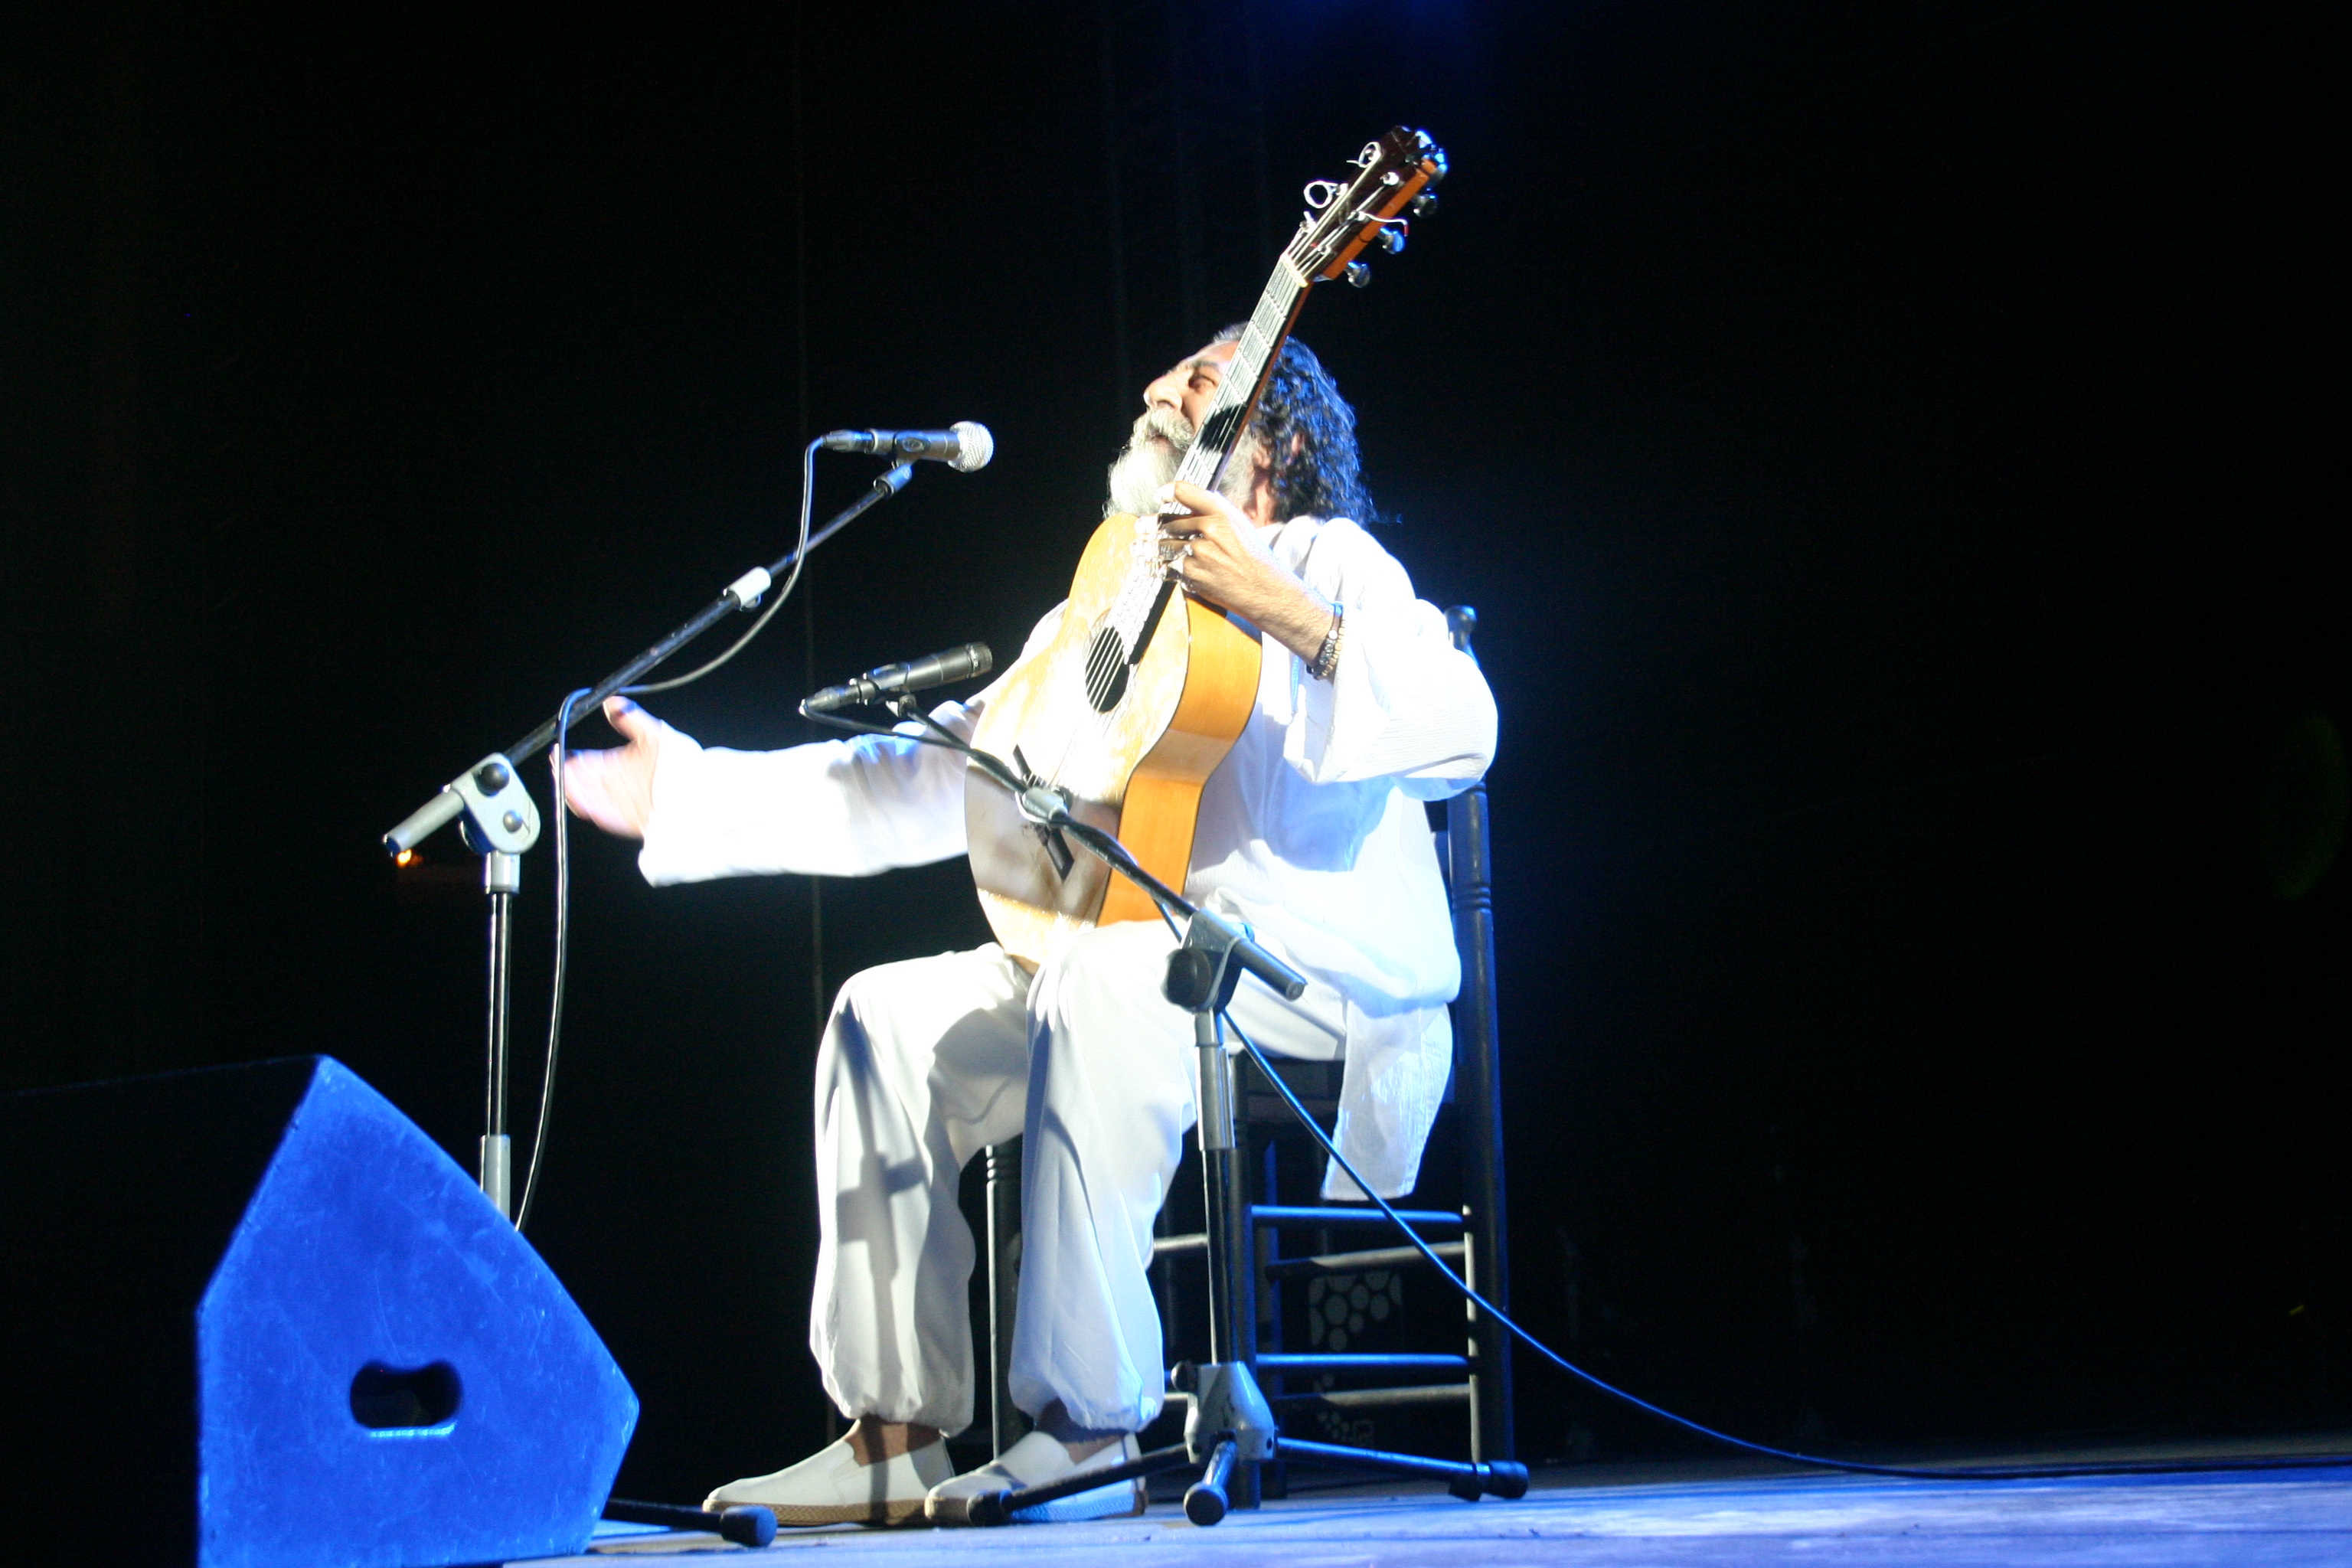 Manuel Molina2